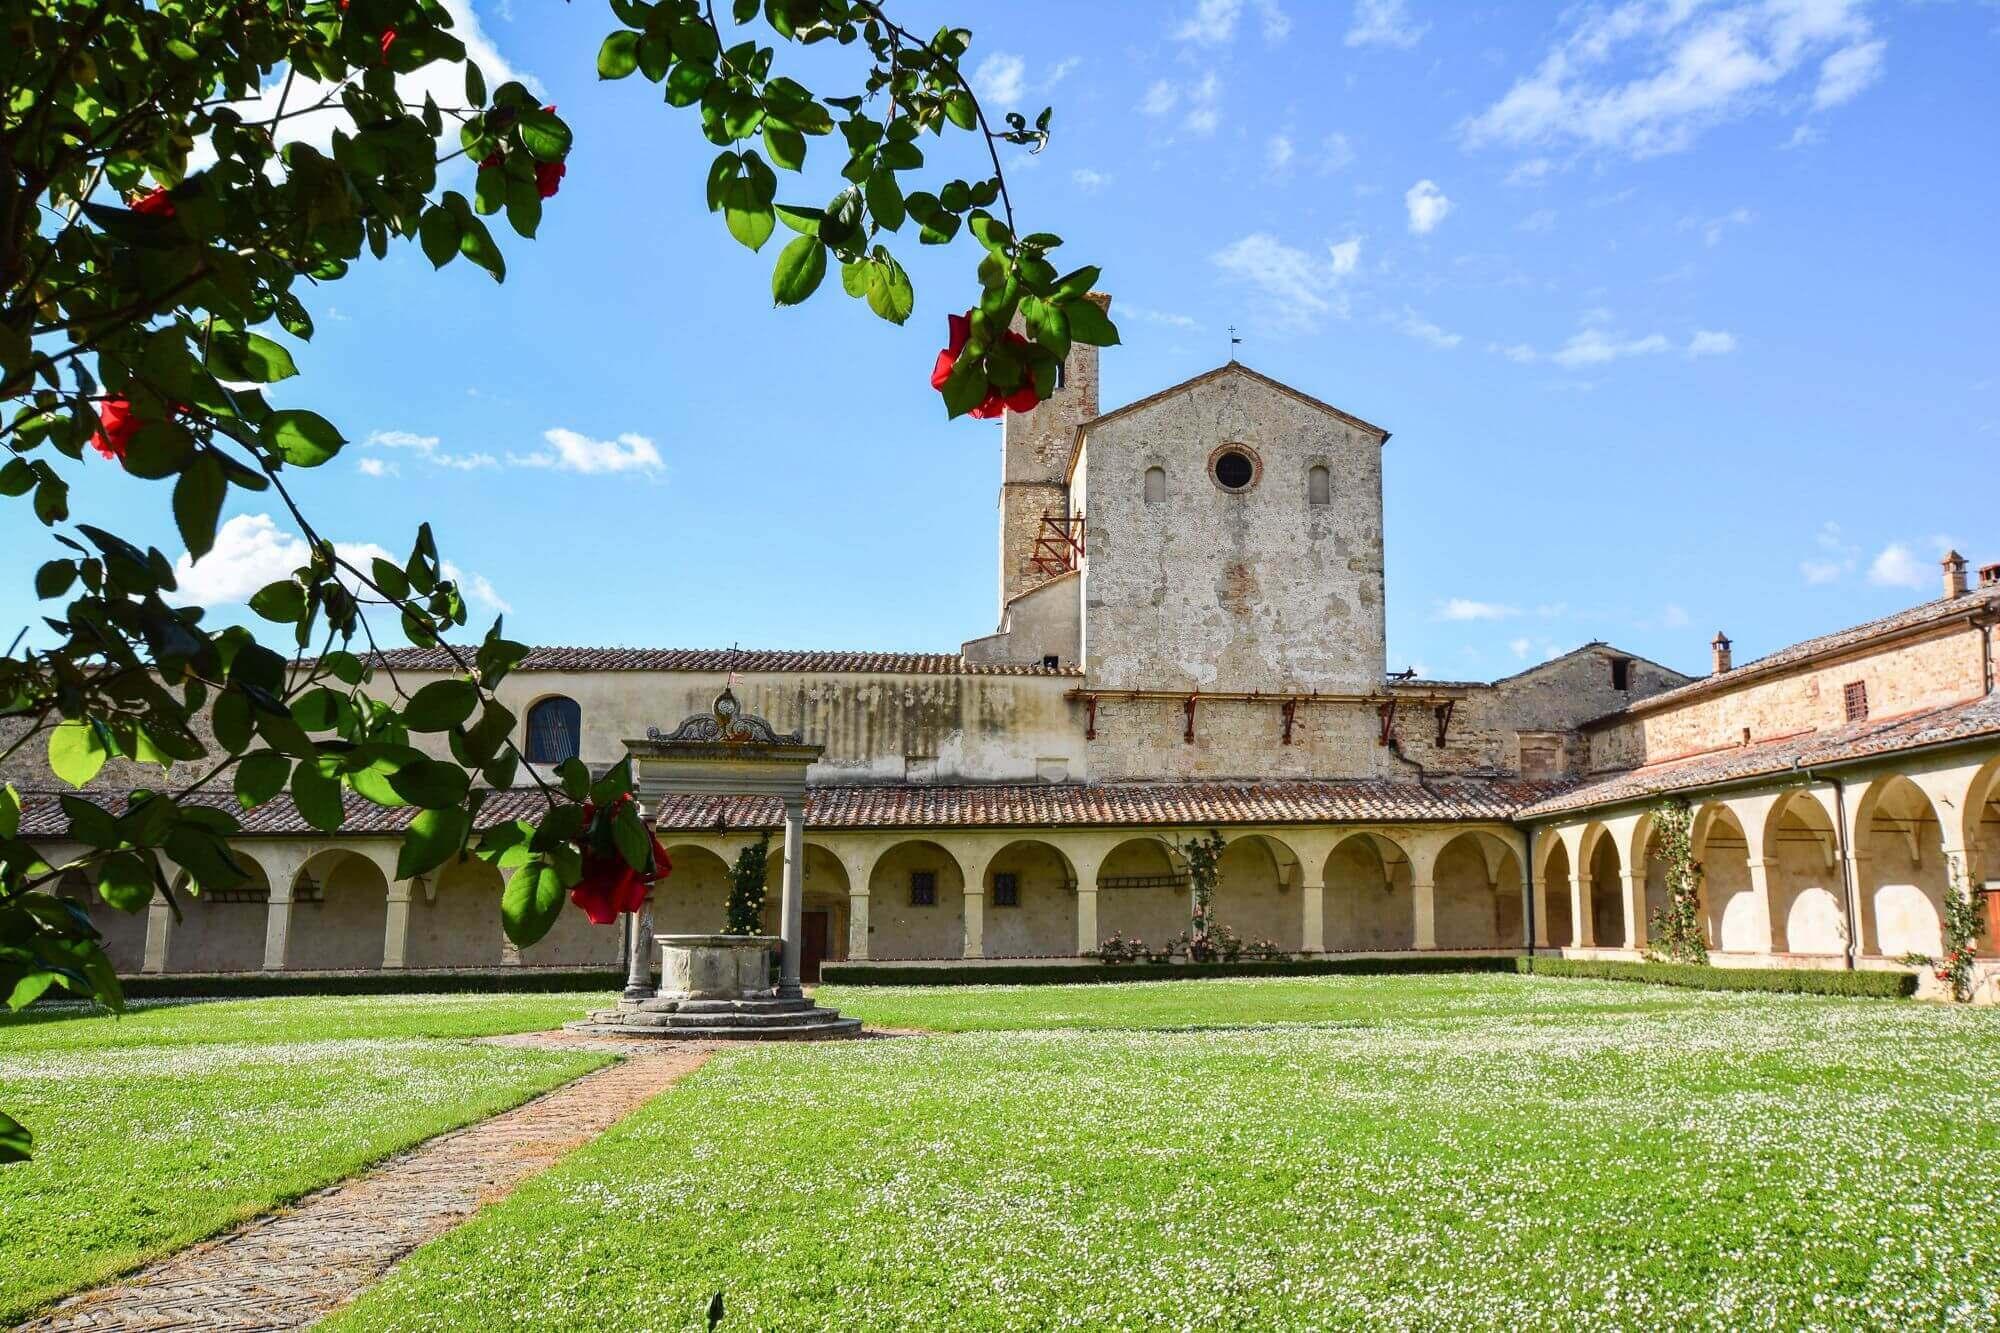 08-VisitChianti-Certosa-di-pontignano-castelnuovo-berardenga-toscana-2000x1333